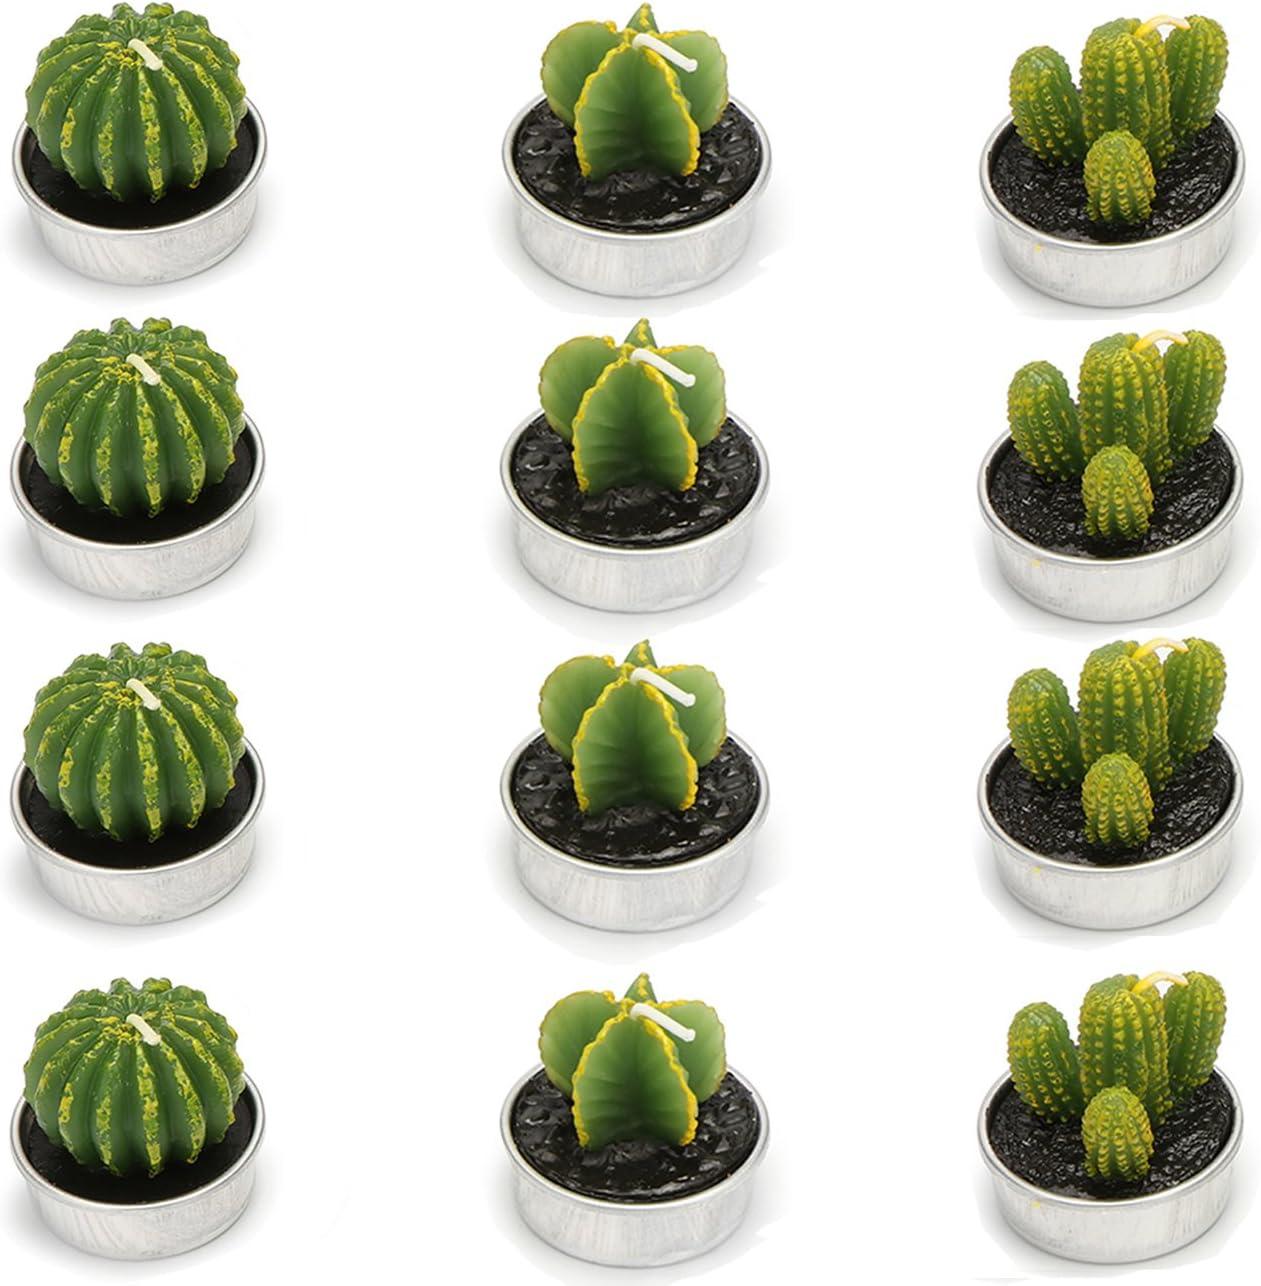 Ogrmar 12 Baltimore Mall PCS Cactus Candles Decorative Ho for Finally resale start Light Tea